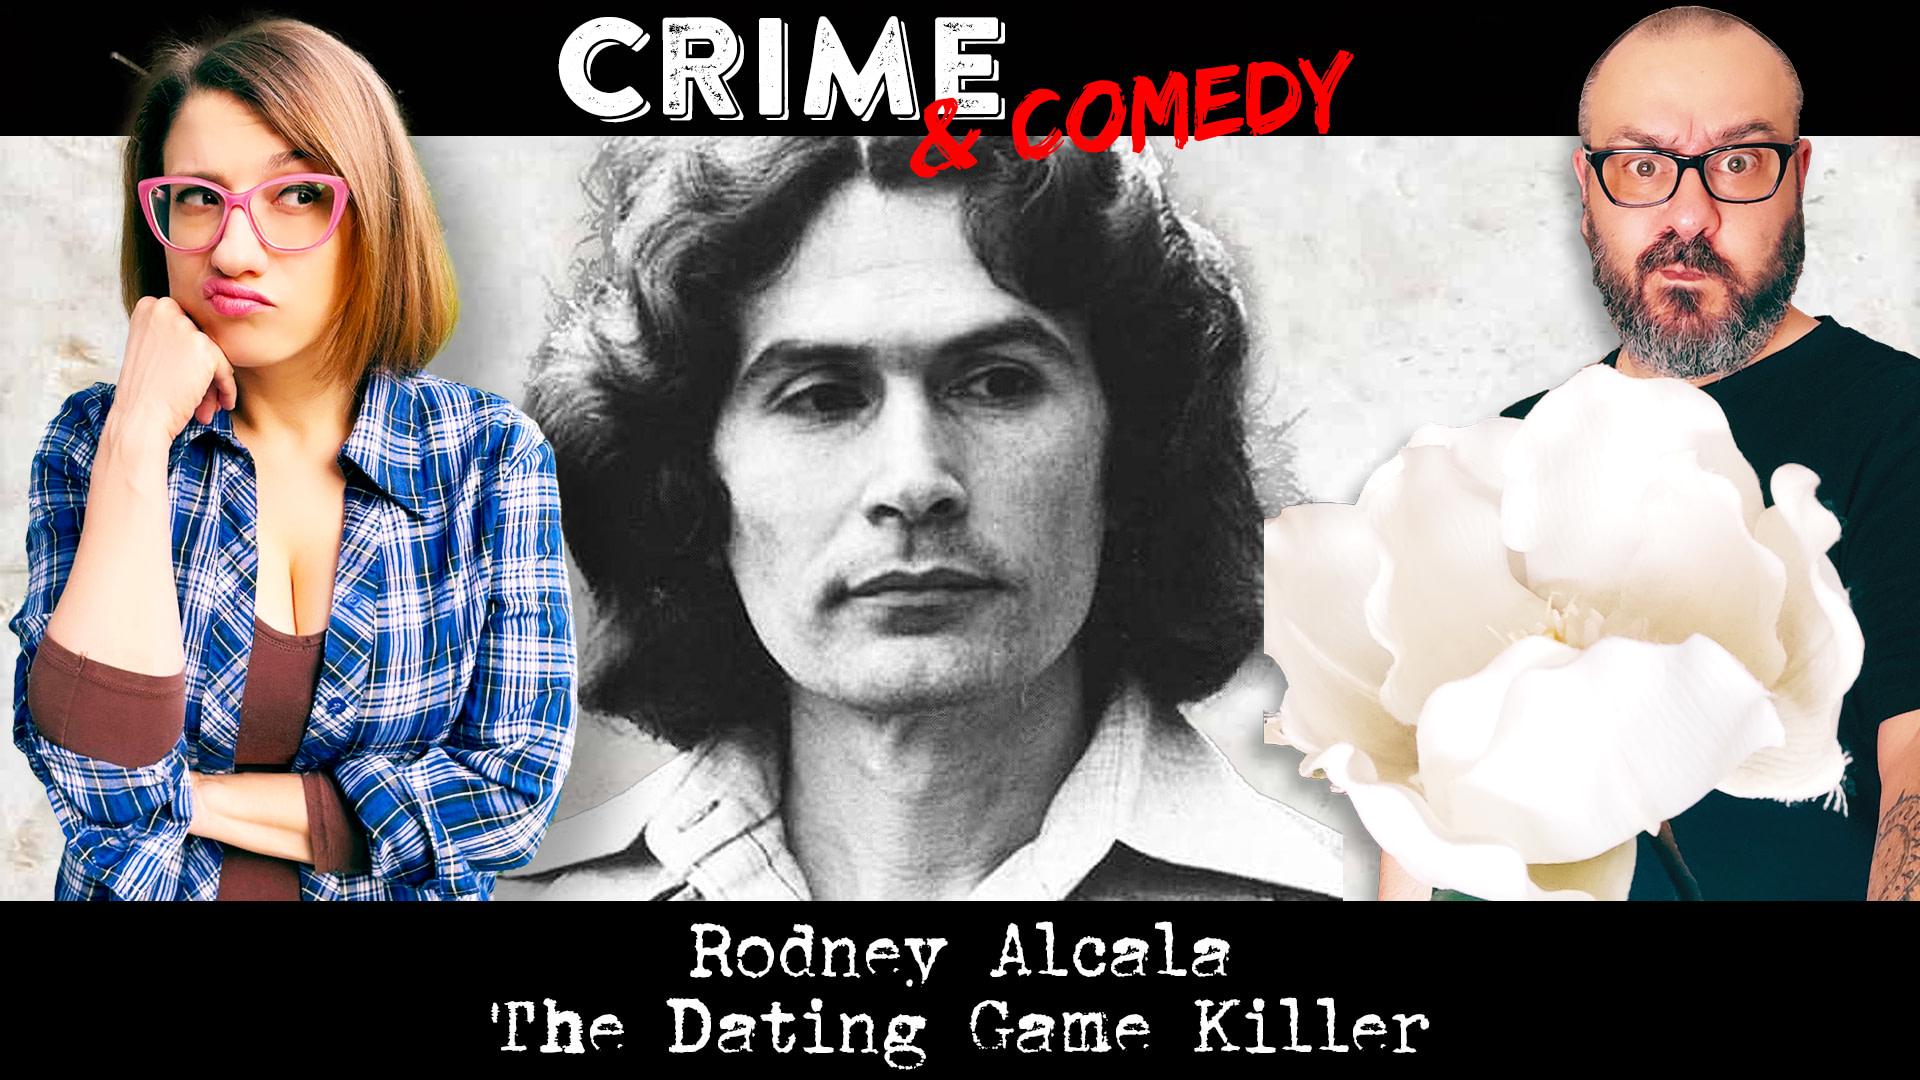 Rodney Alcala - Podcast - The Dating Game Killer - Crime & Comedy